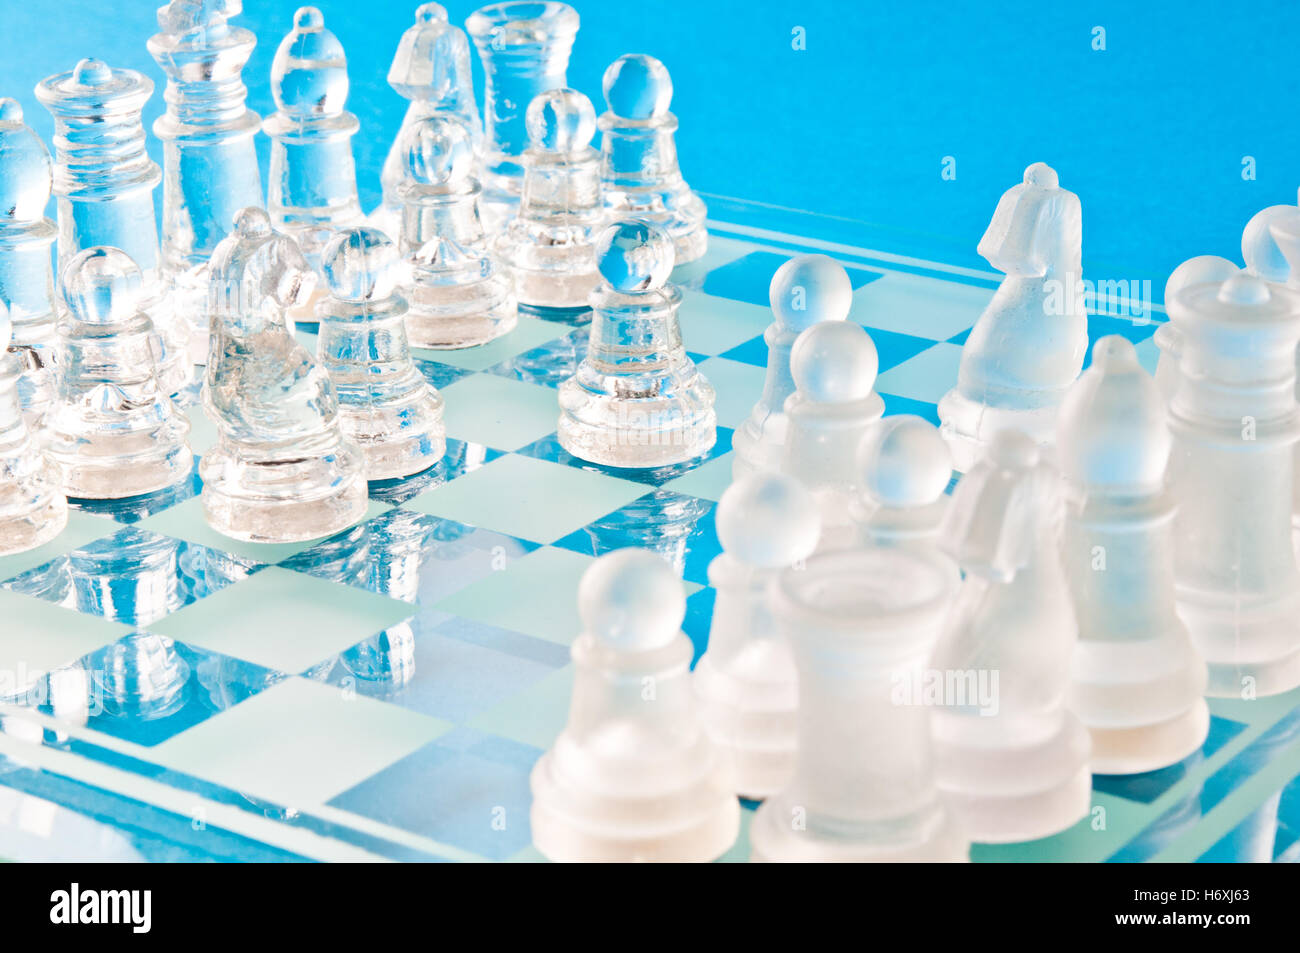 jeu d'échecs en verre Banque D'Images